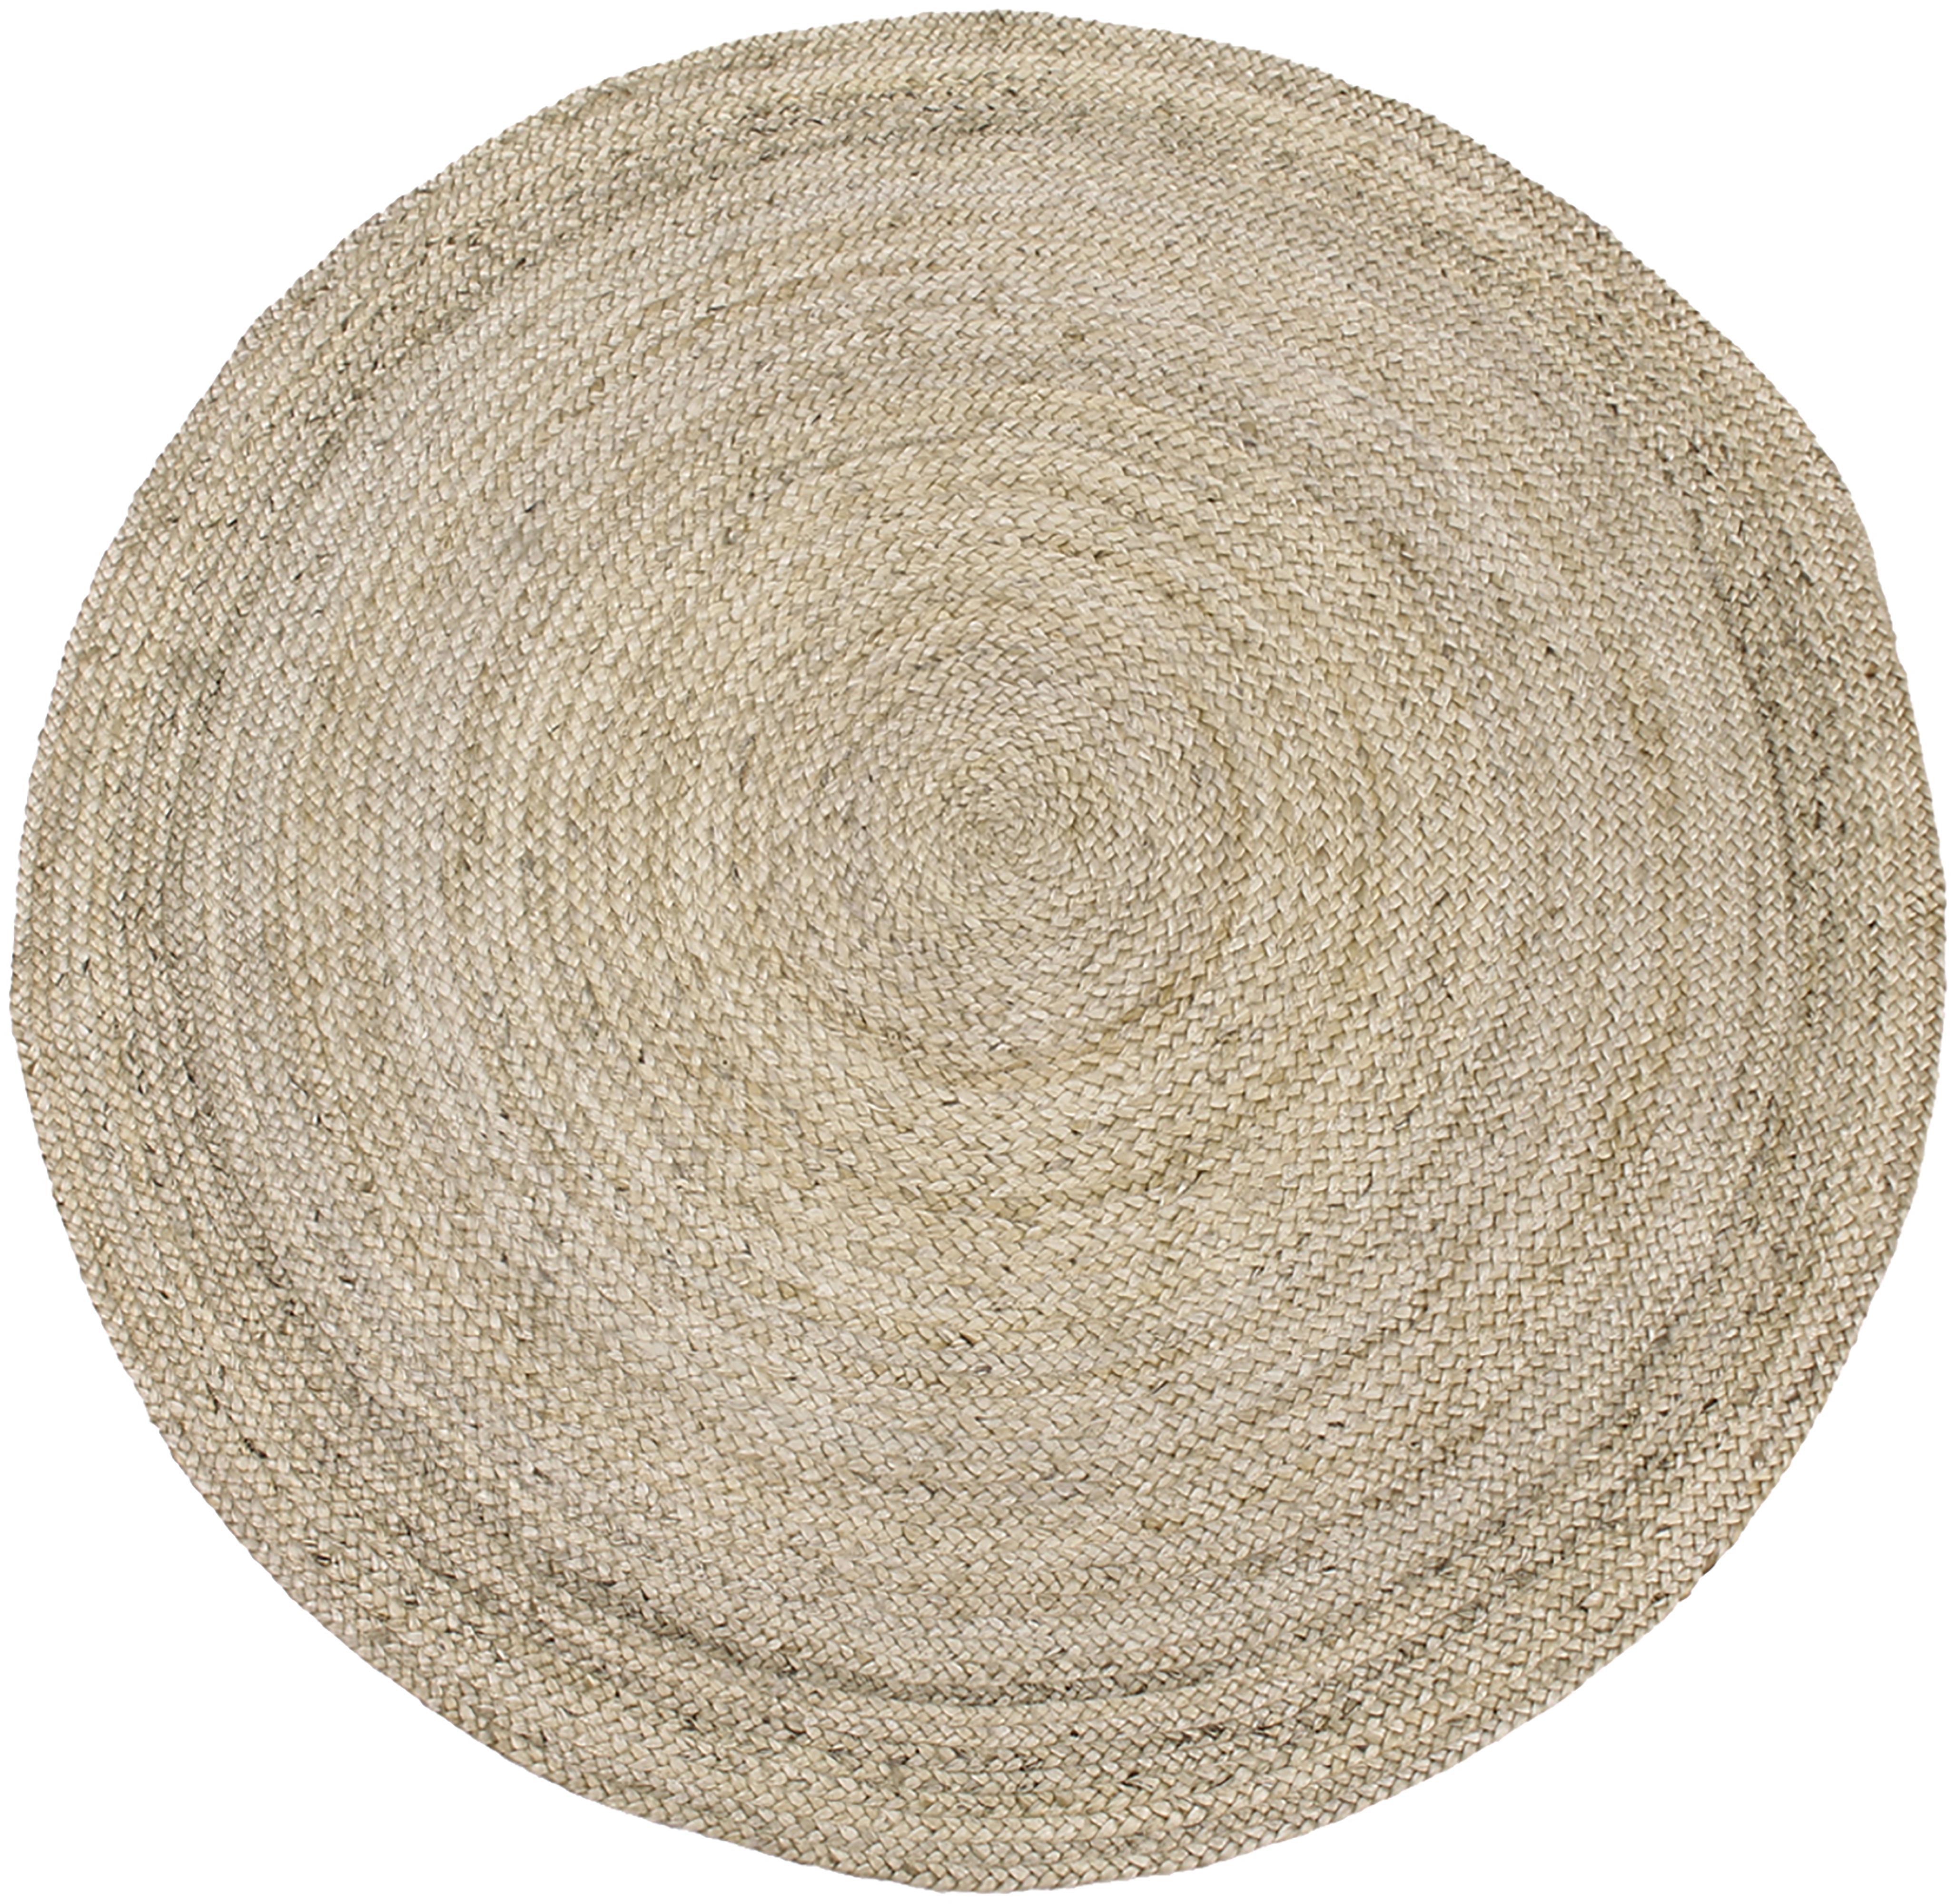 Alfombra redonda artesanal de yute Sharmila, Parte superior: yute, Reverso: yute, Beige, Ø 140 cm (Tamaño M)